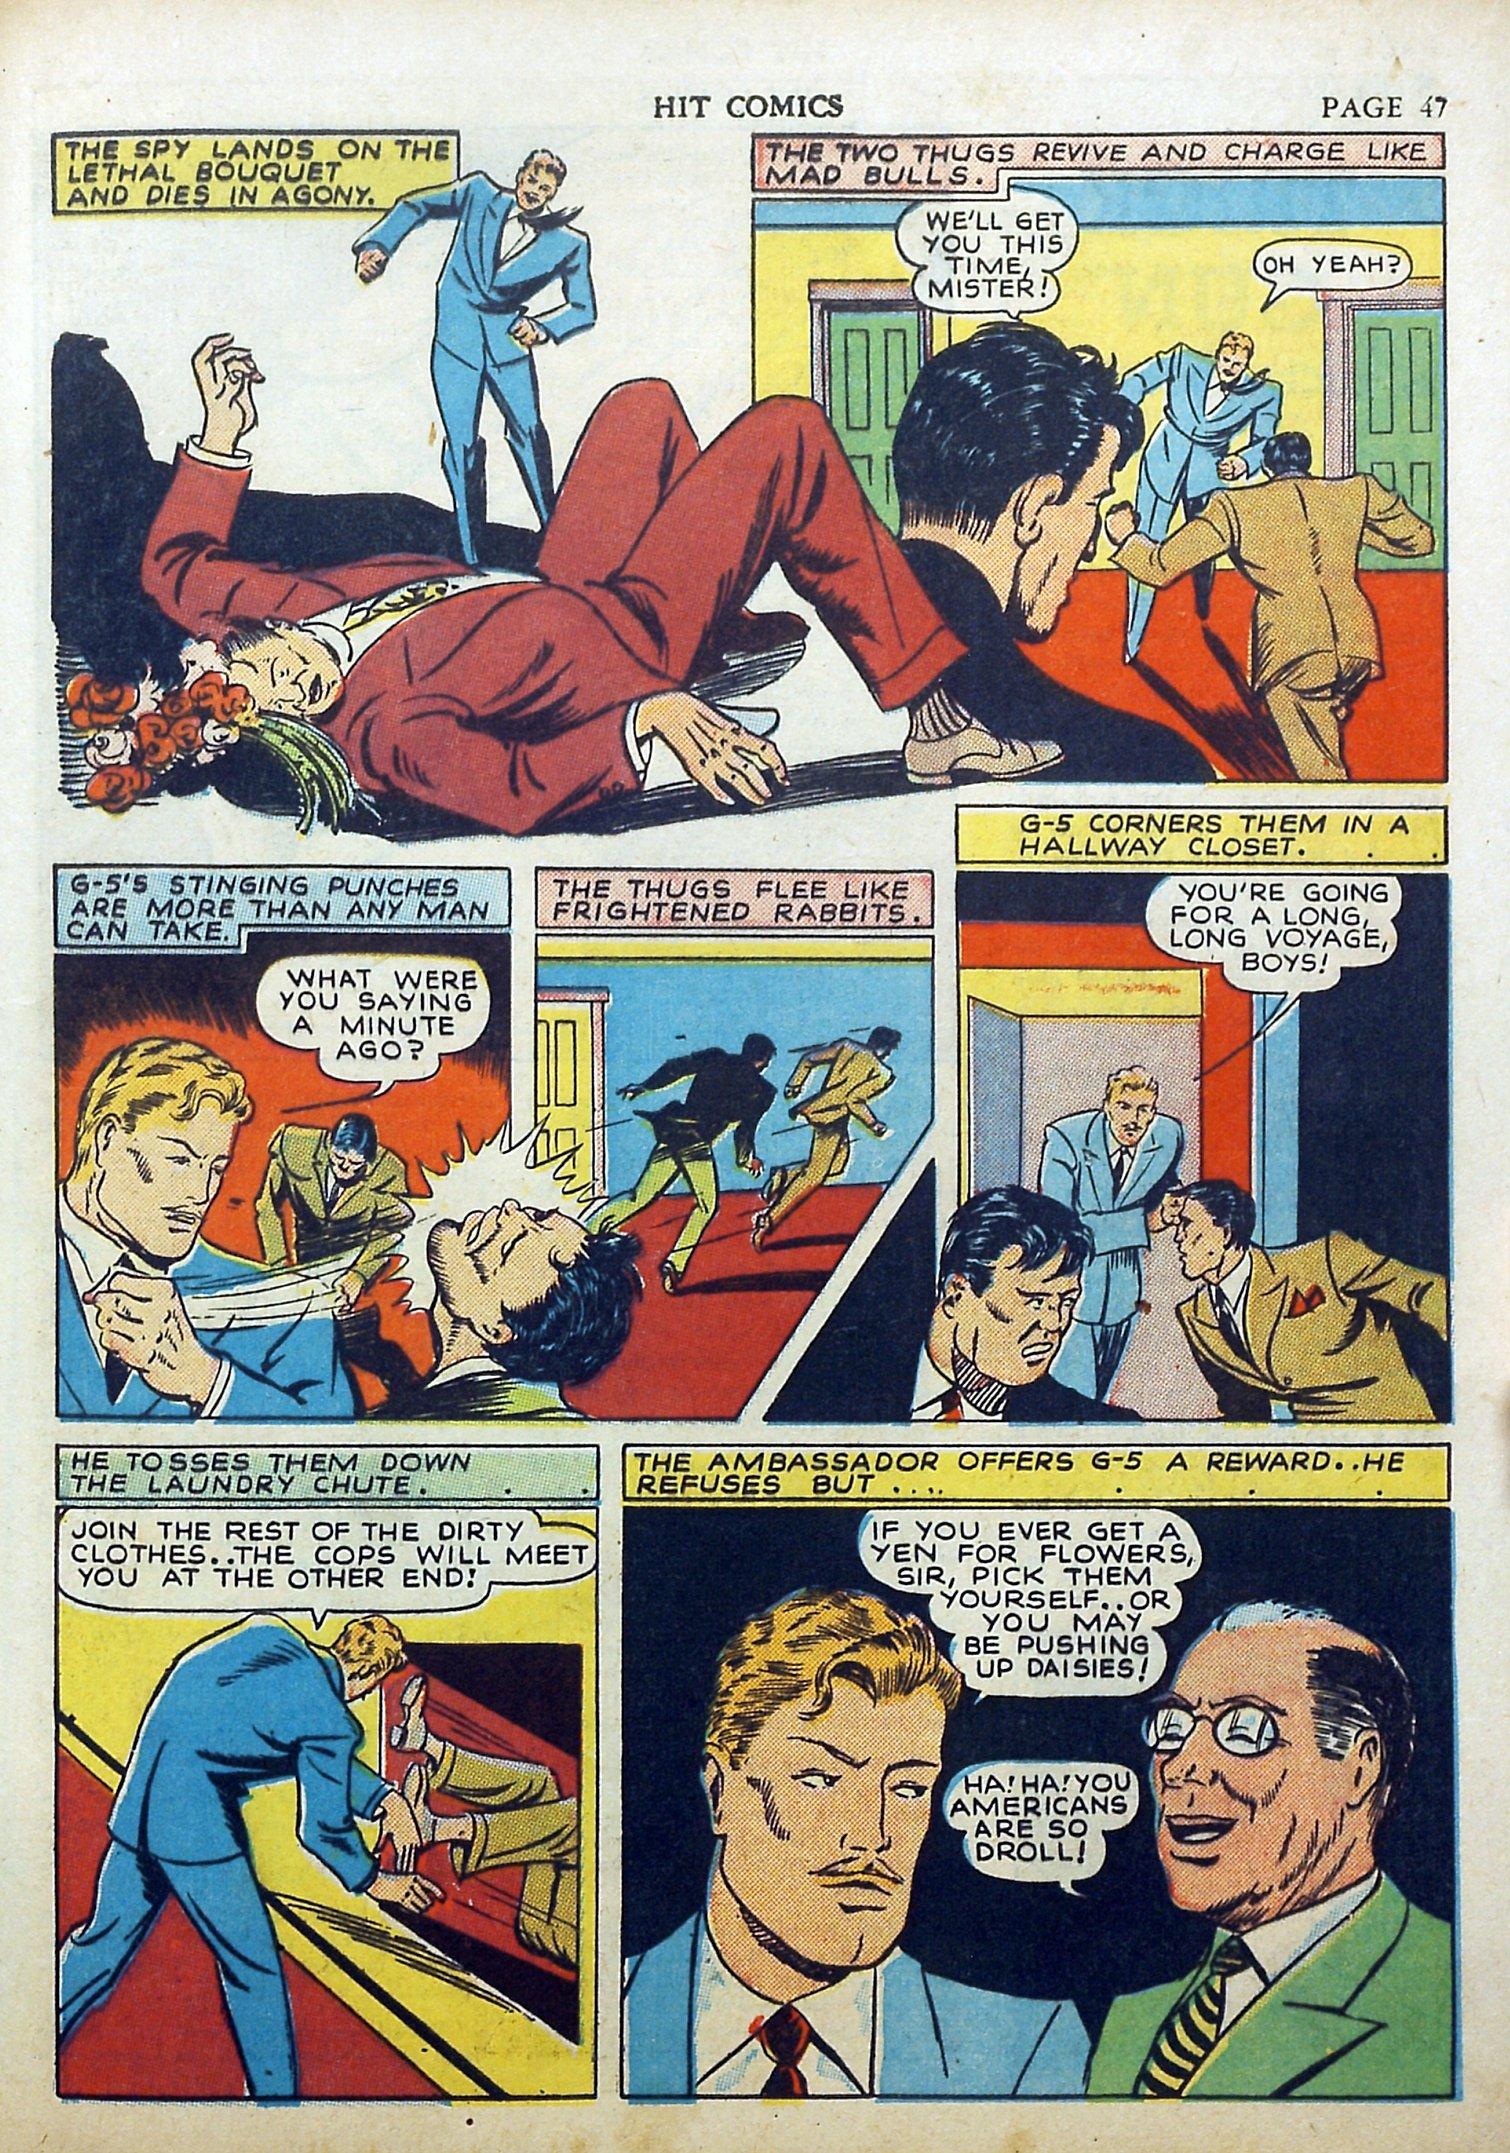 Read online Hit Comics comic -  Issue #17 - 49